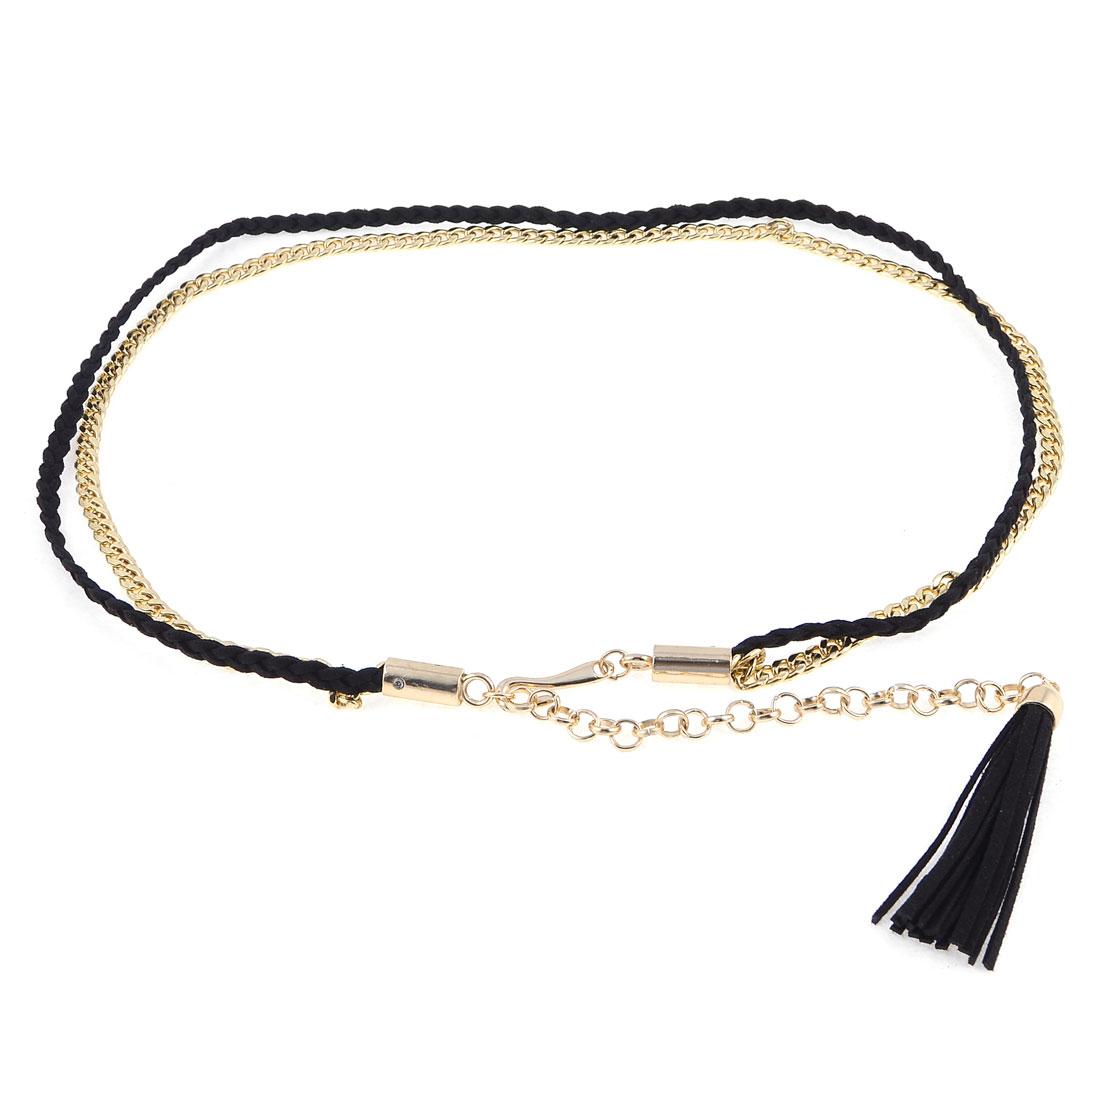 Black Faux Leather Tassels Gold Tone Metal Rolo Chain Belt